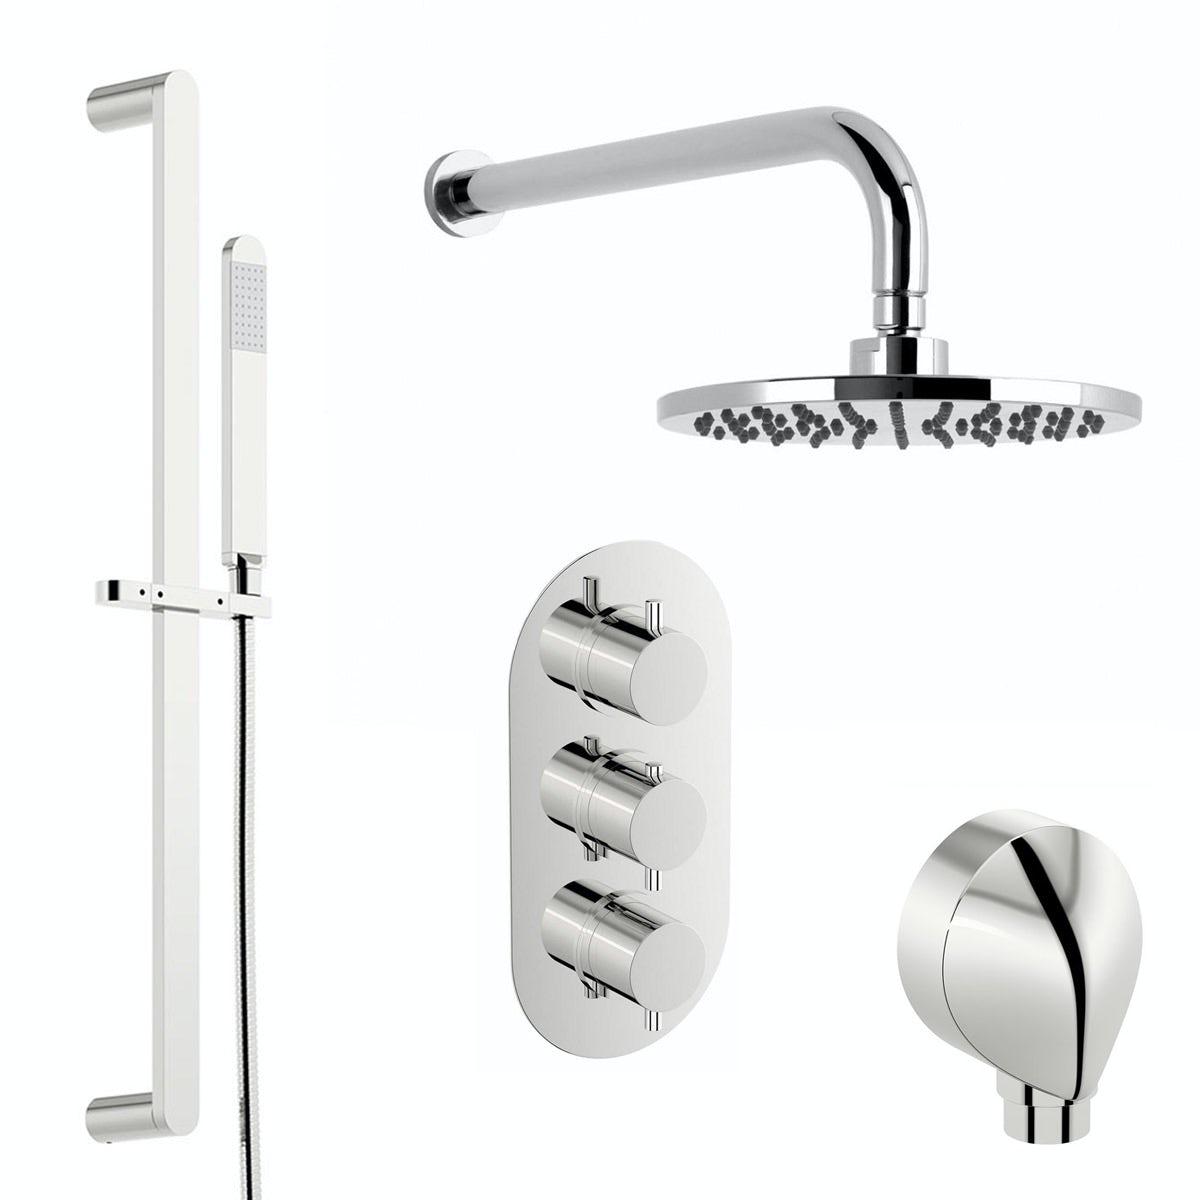 Mode Harrison thermostatic triple shower valve shower set